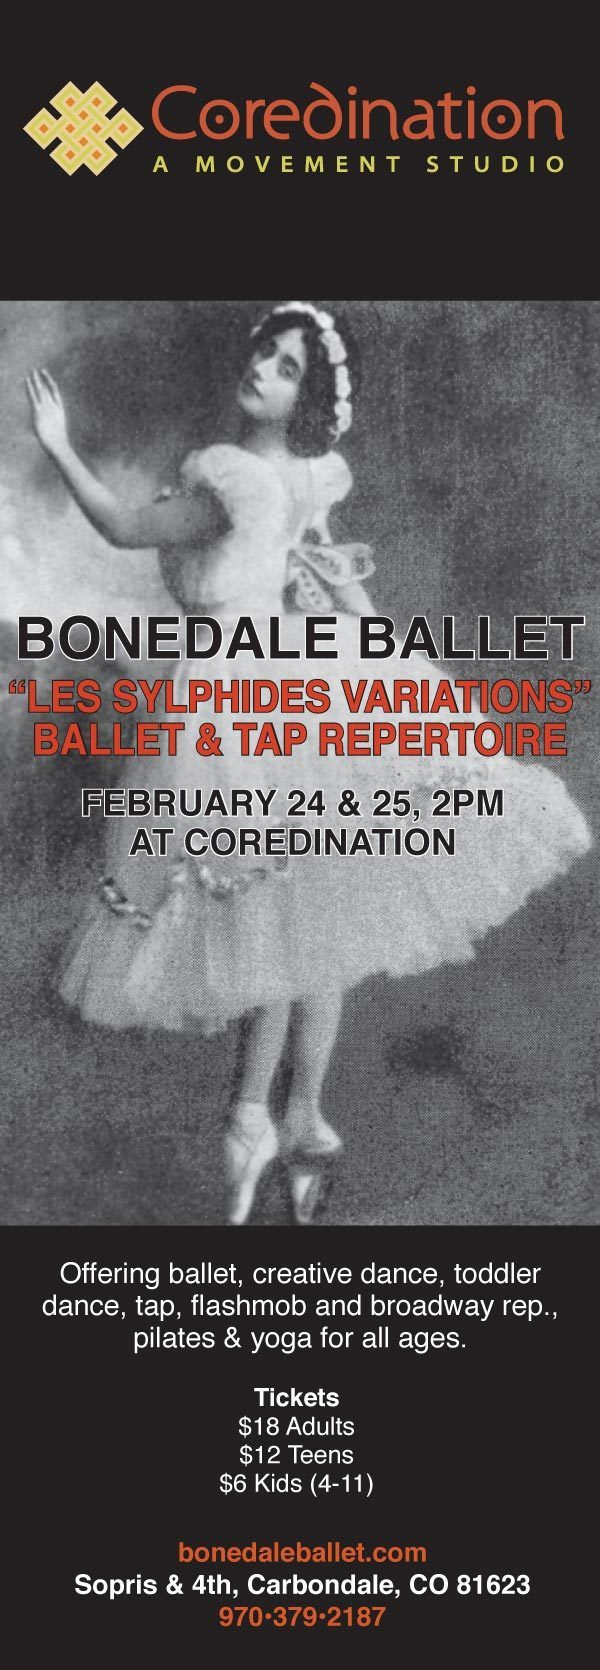 BONEDALE-BALLET_8thV_021518rev thumbnail